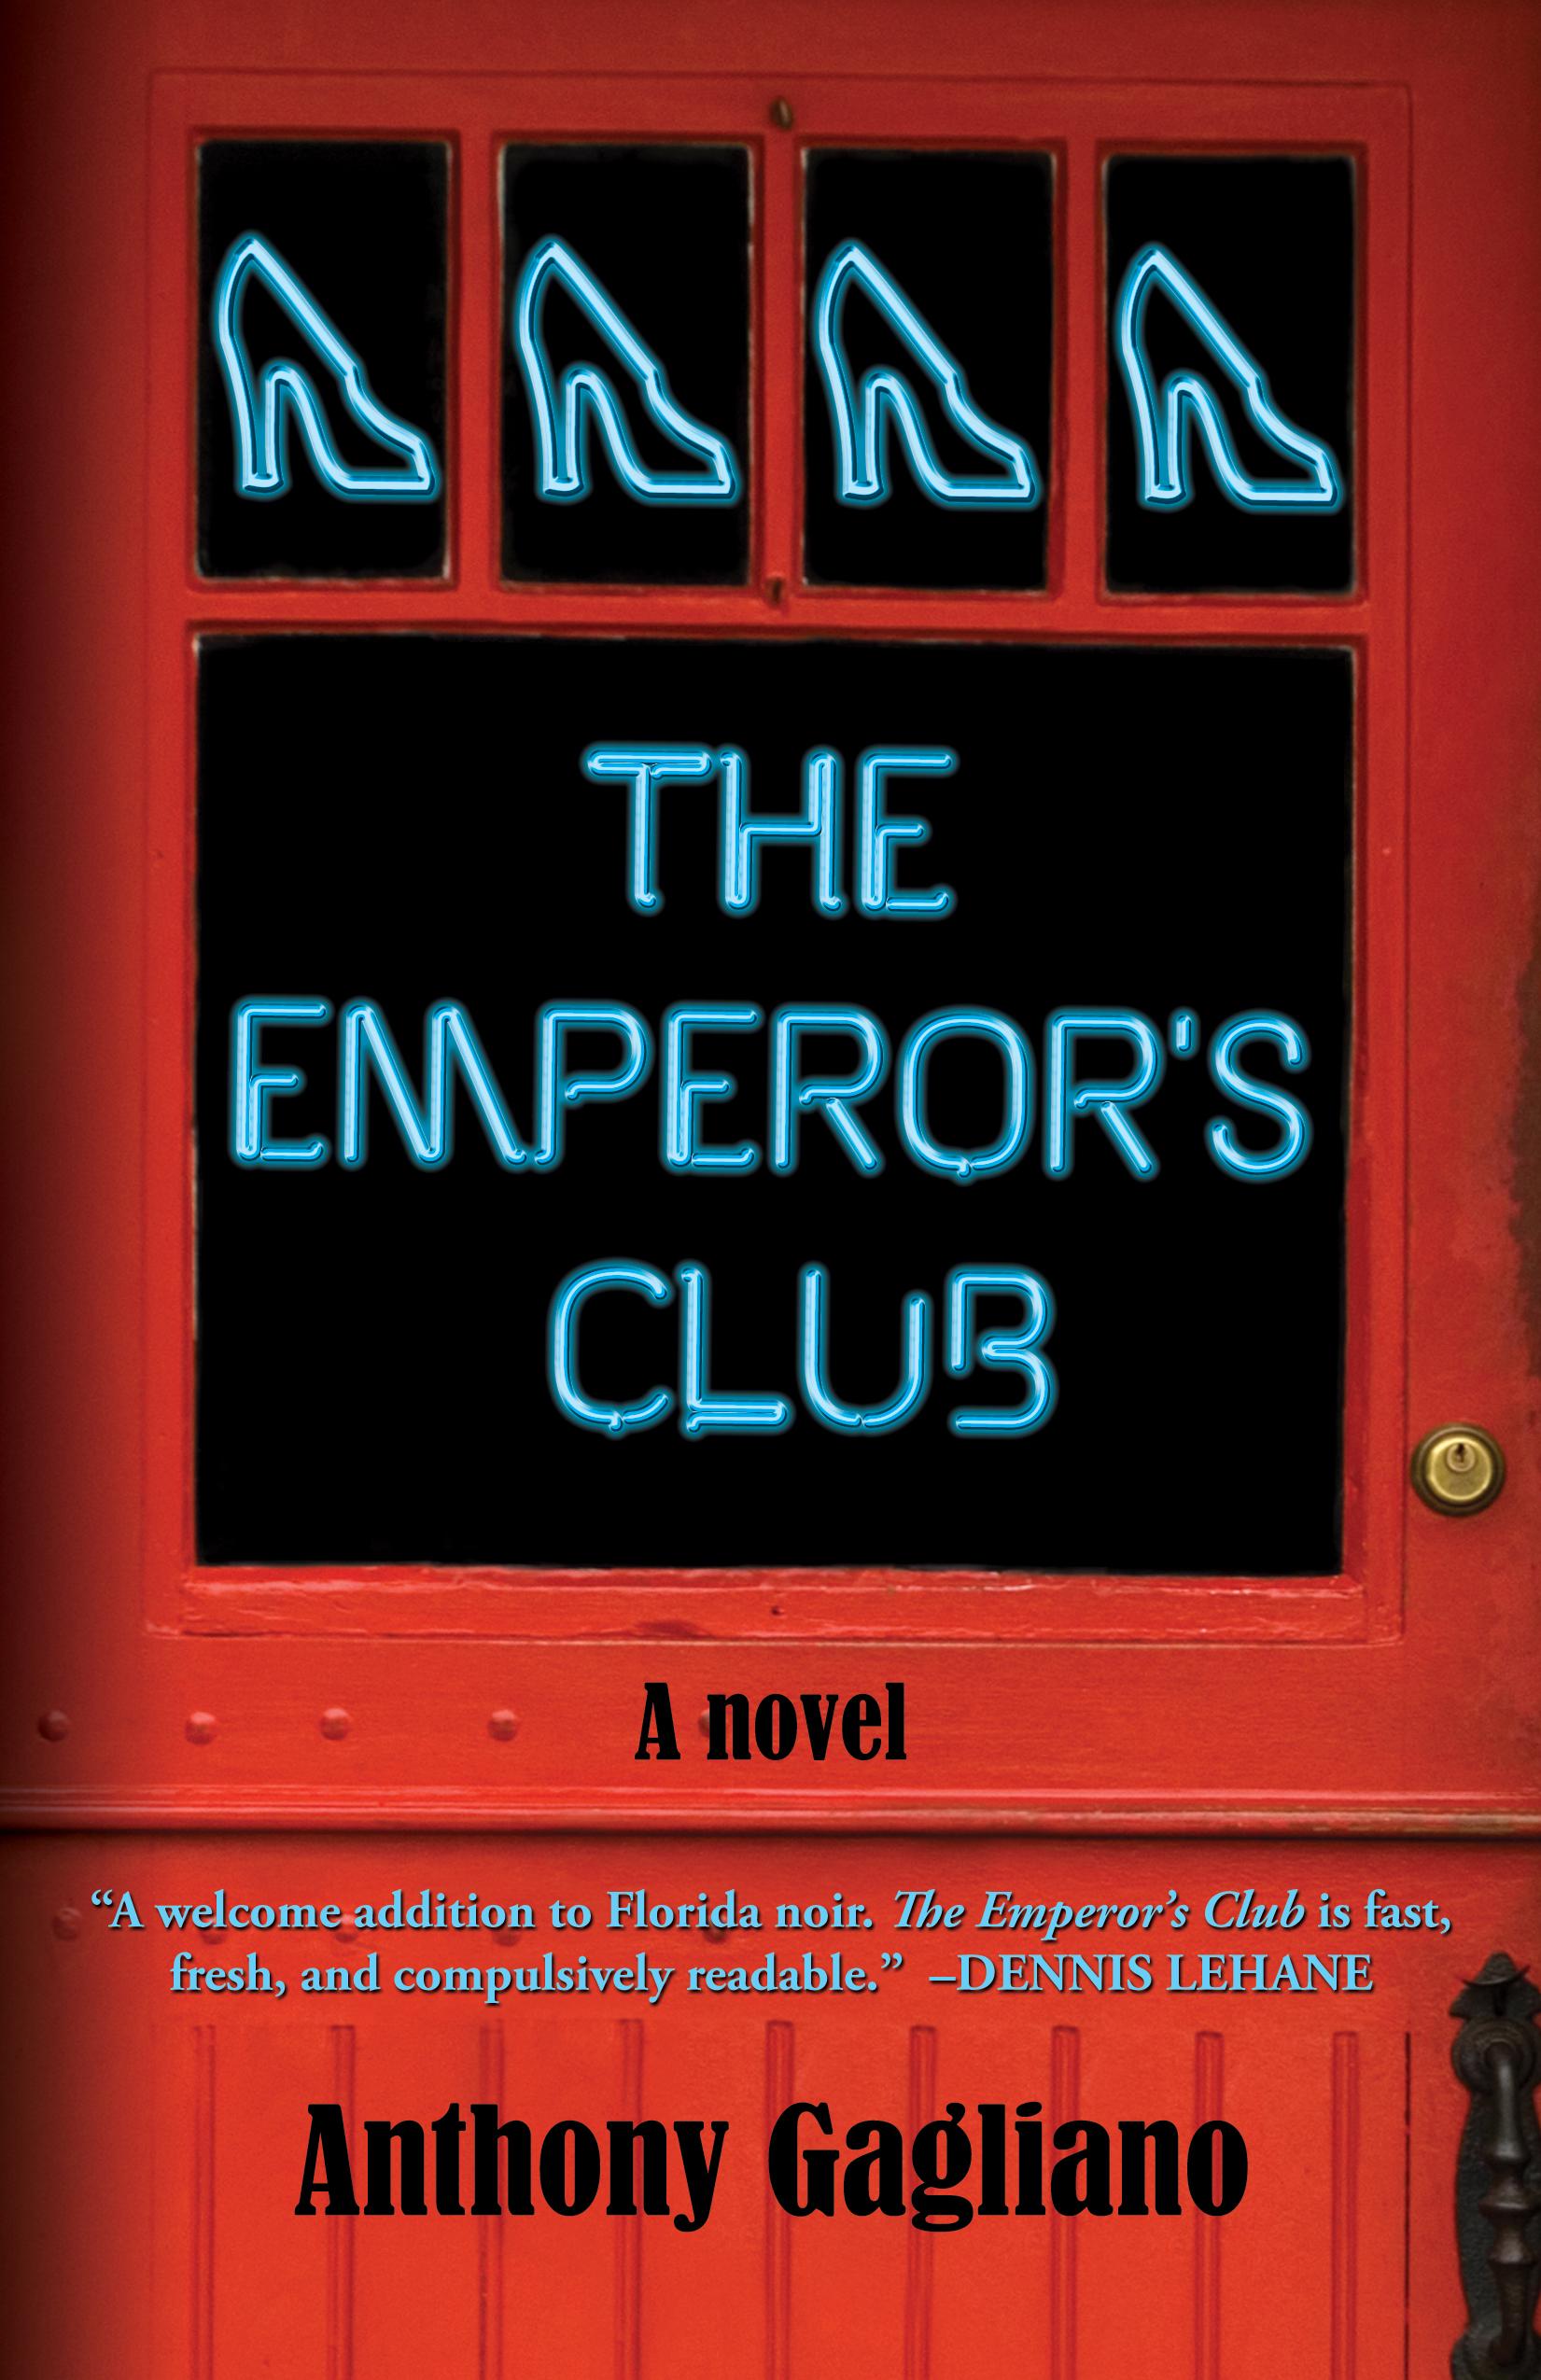 The Emperor's Club cover